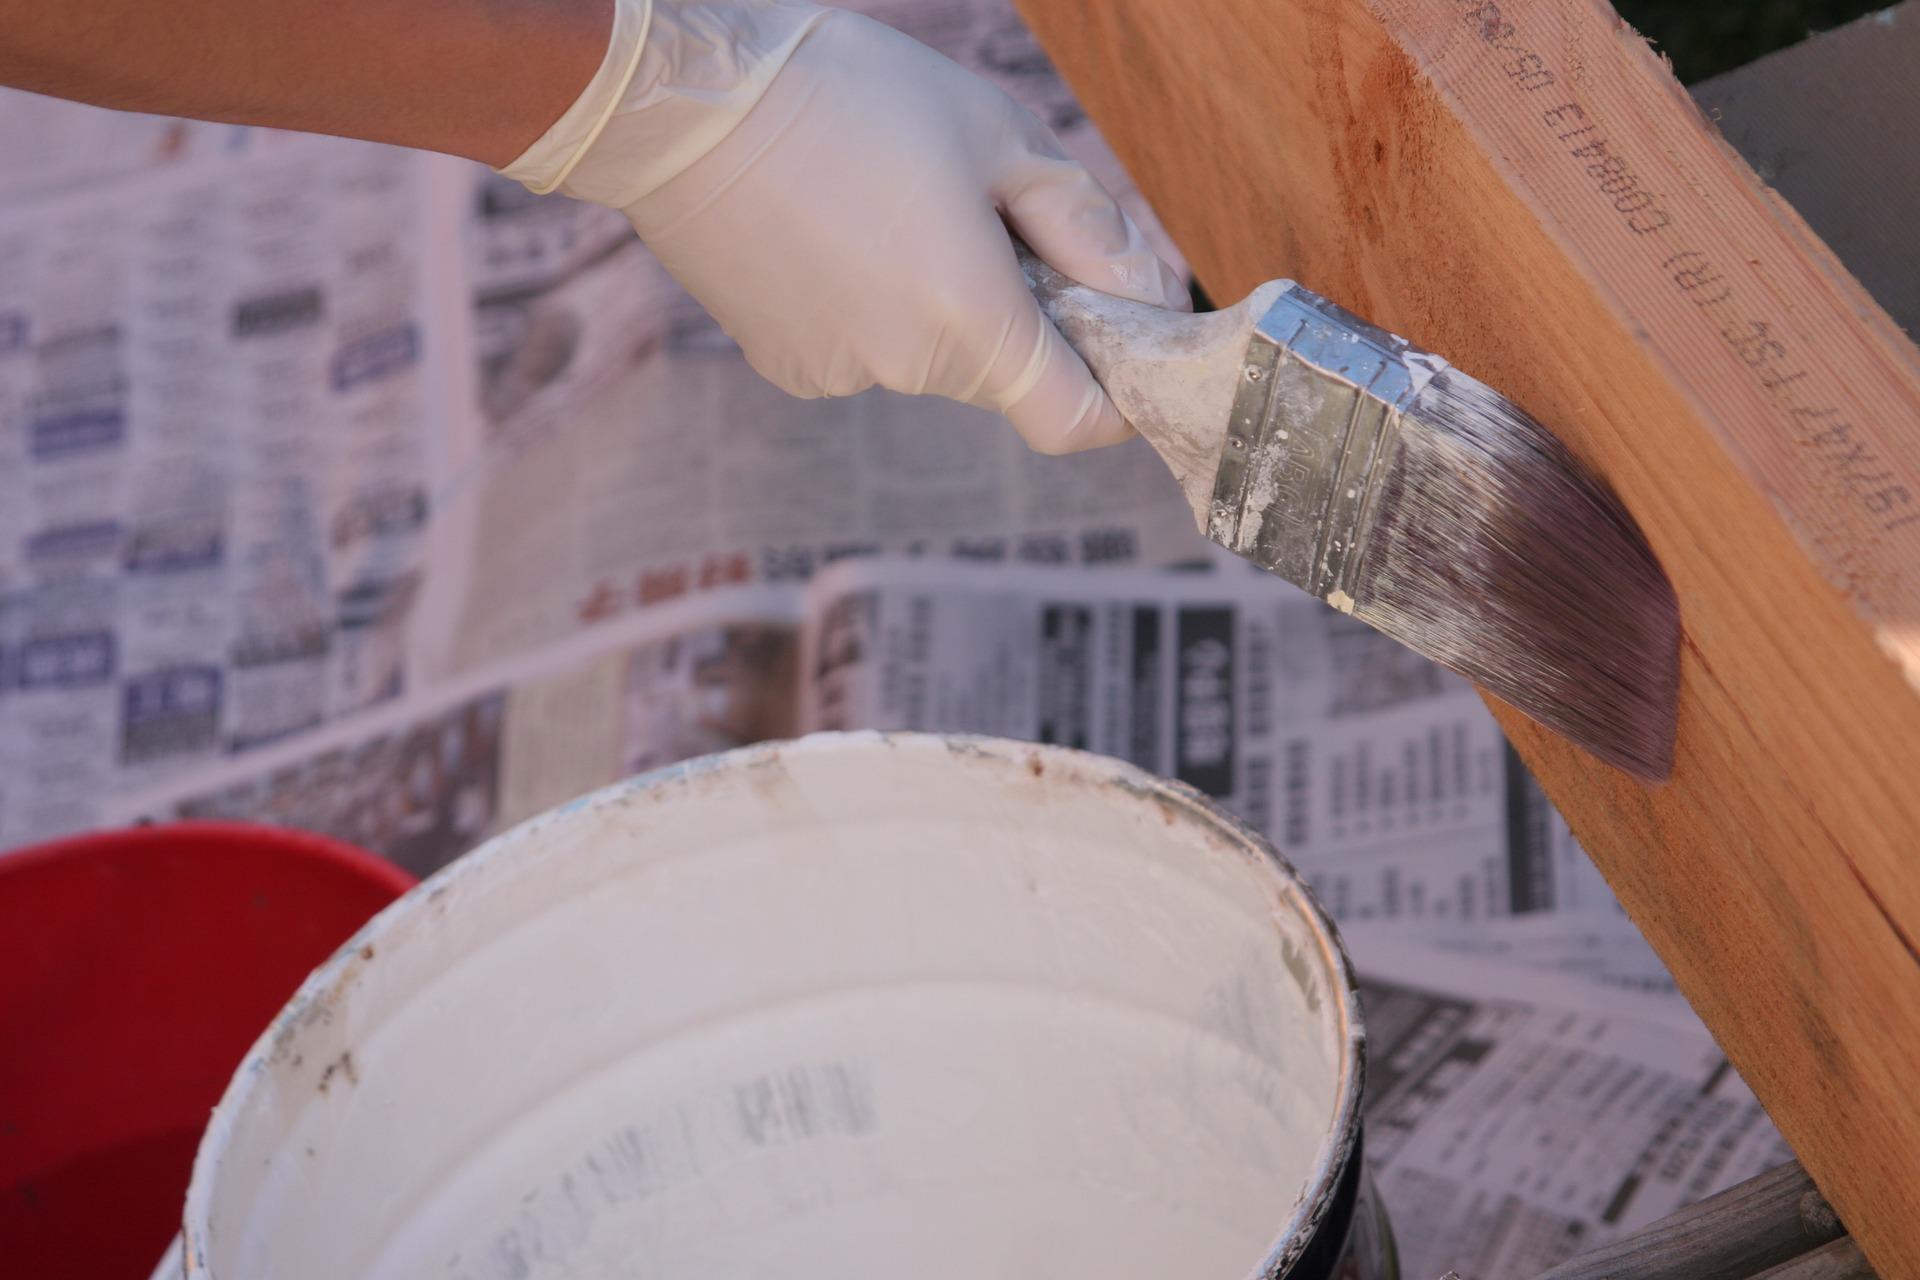 Malermester Kent Stimose